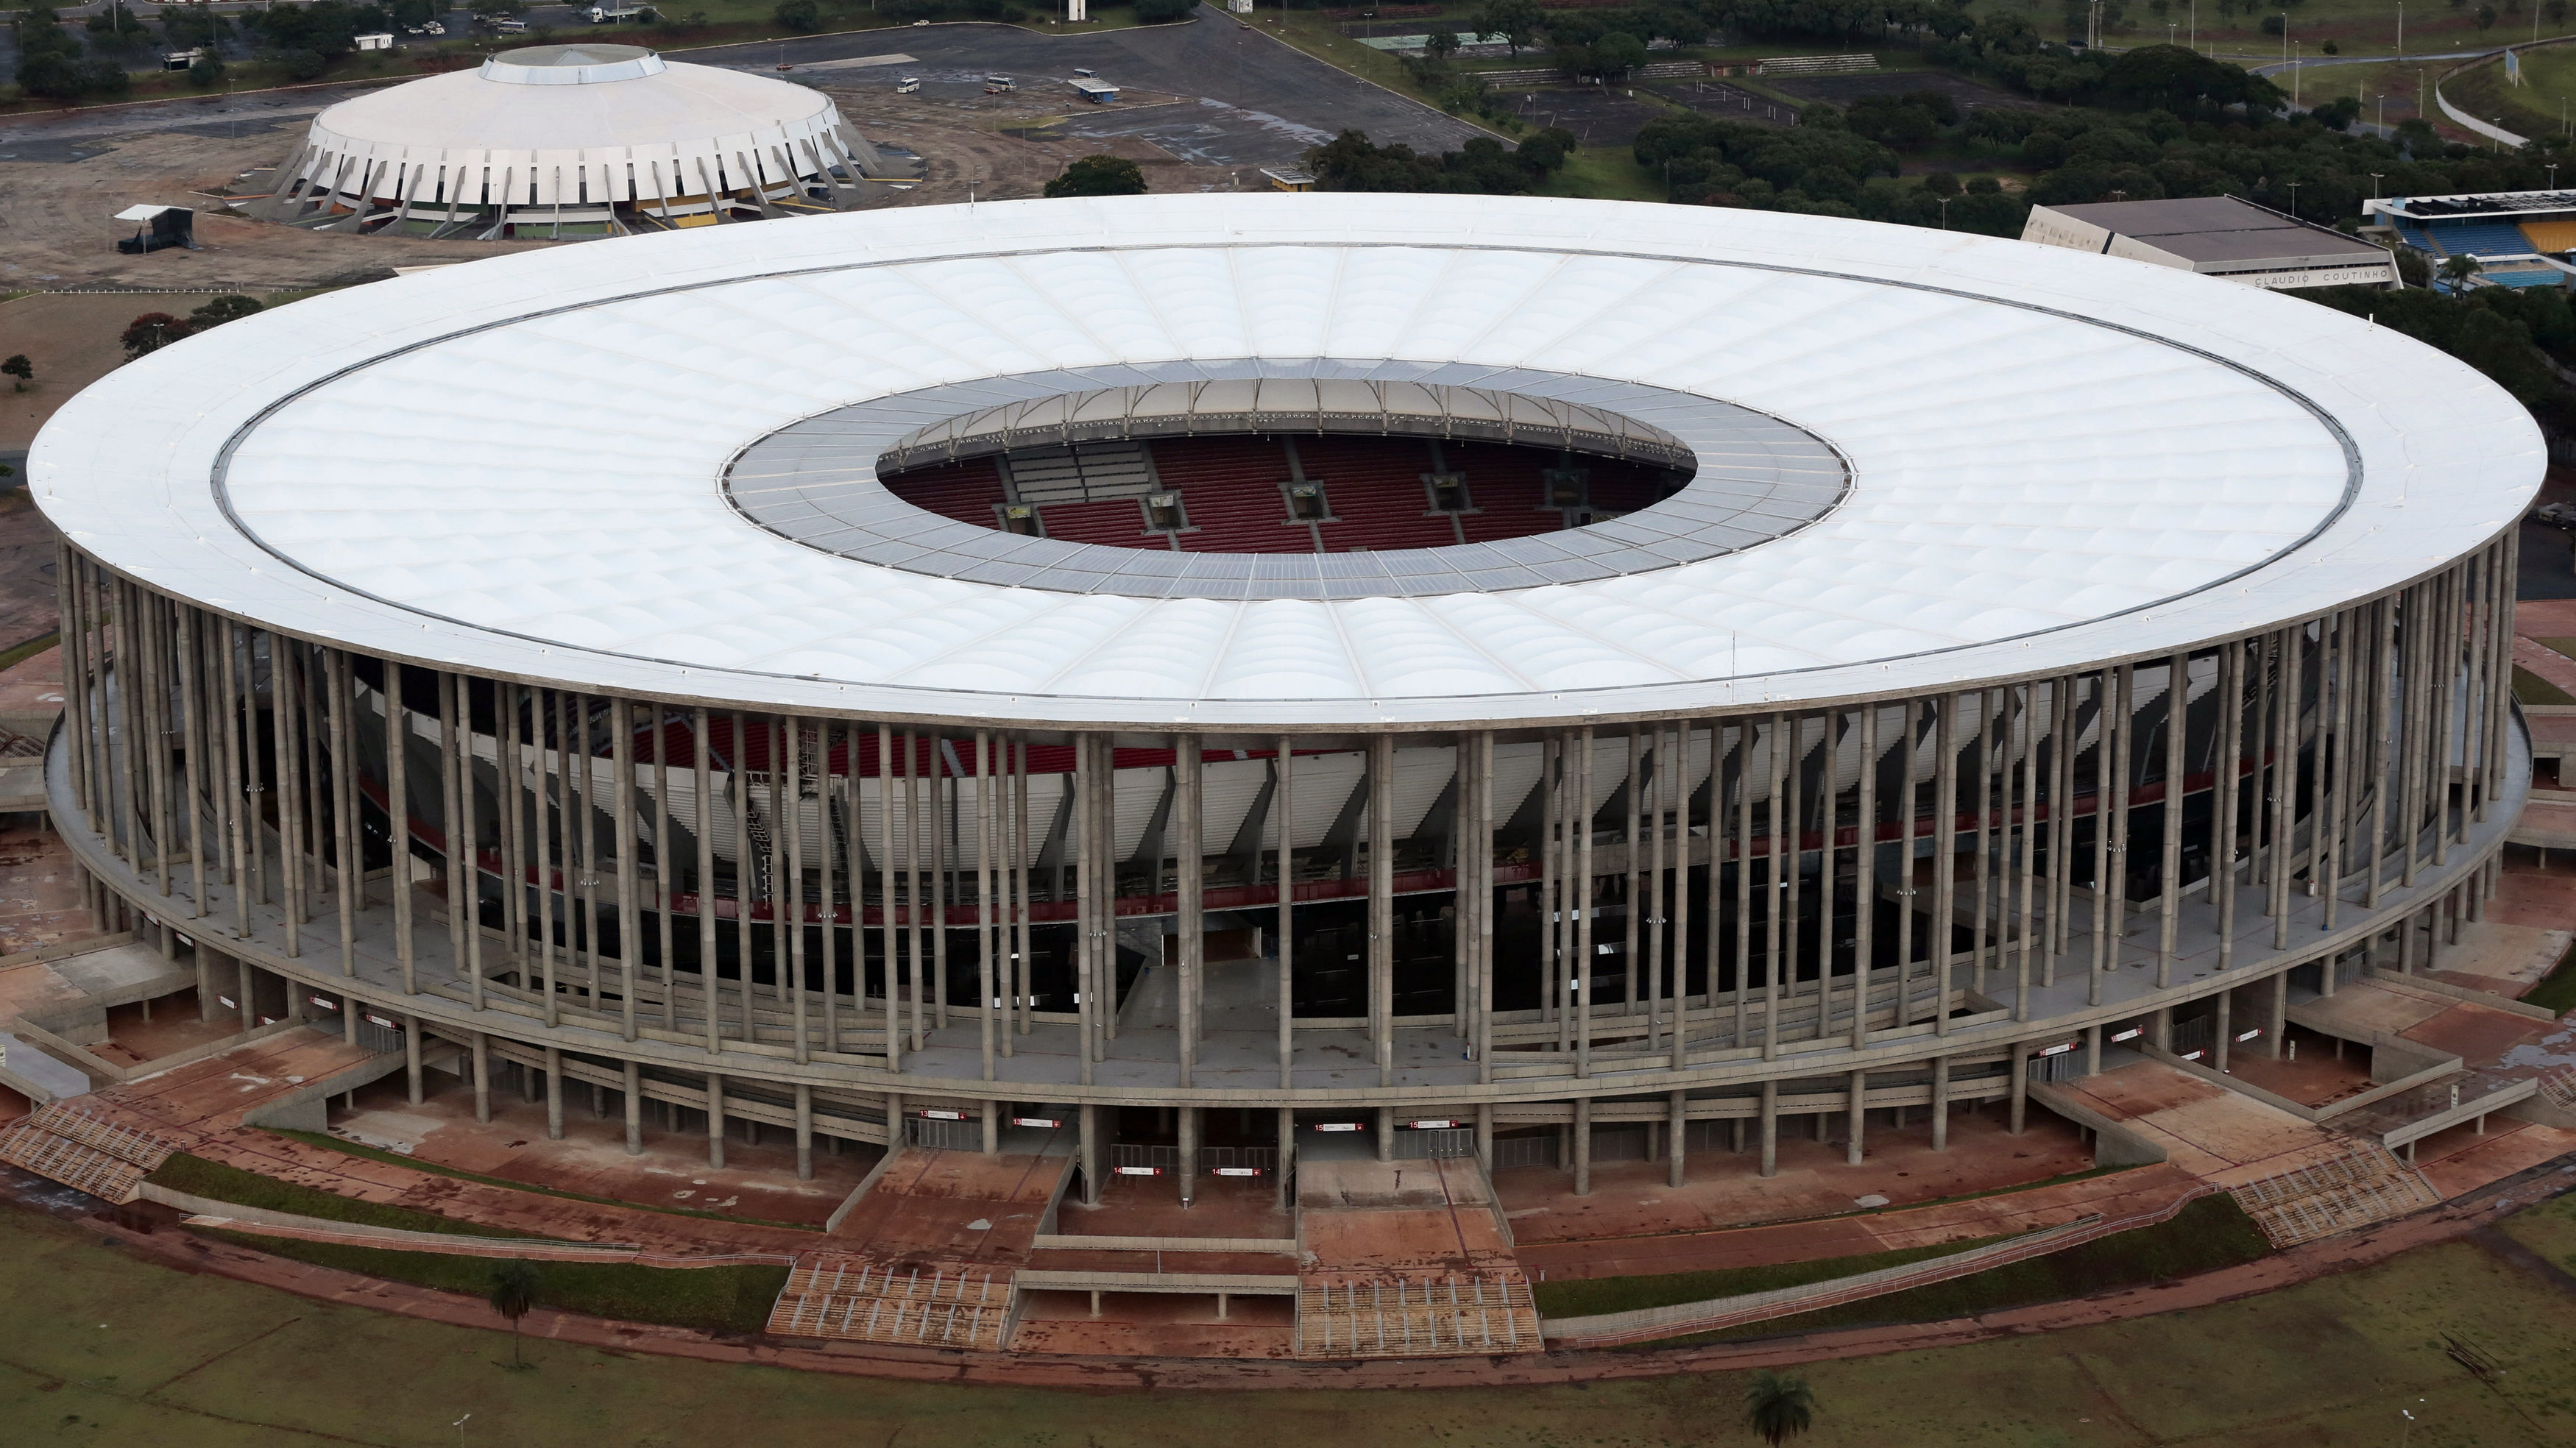 Estadio Nacional                                                              City: Brasilia                                                              Constructed: 2012                                                              Capacity: 69,500